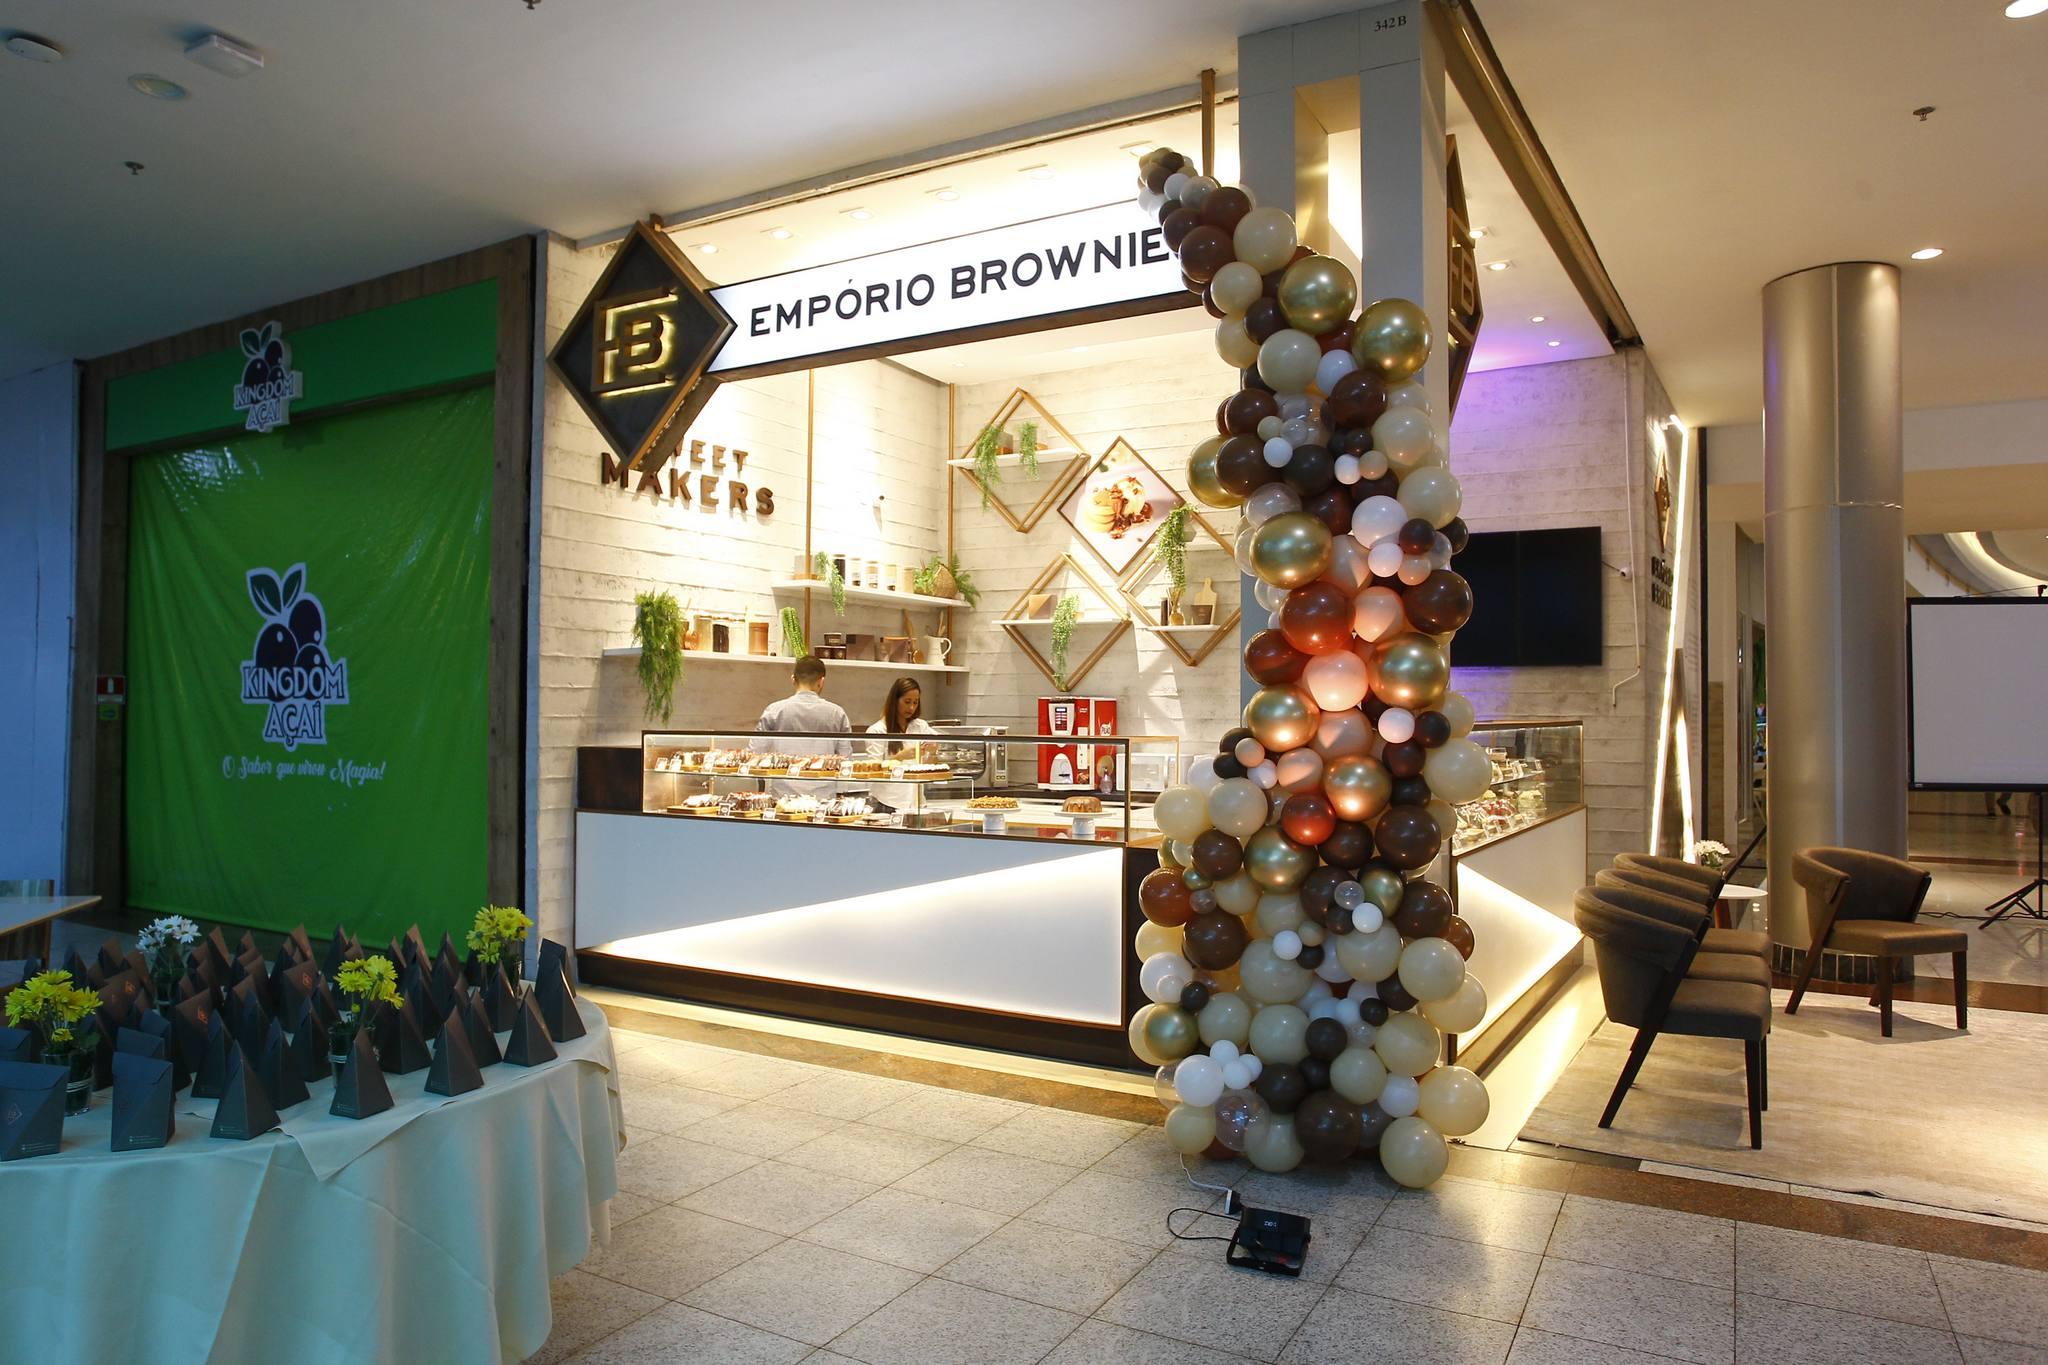 Emporio Brownie (5)